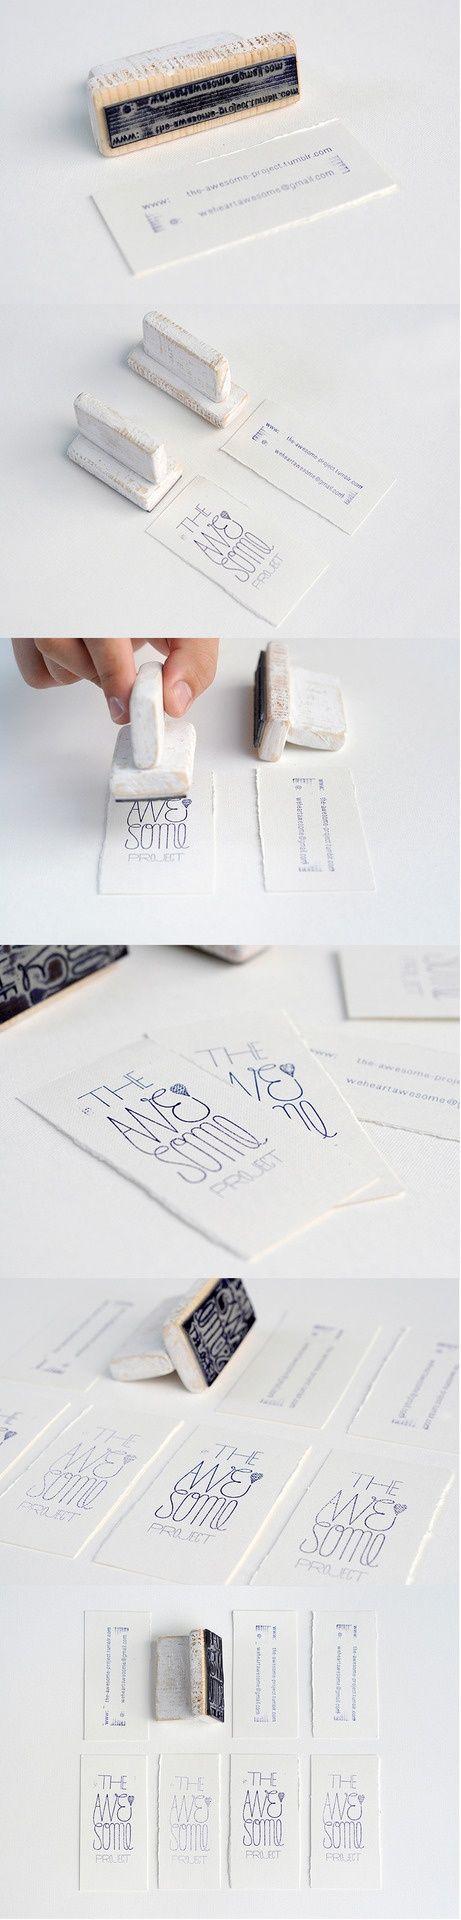 50+ Impressive and Inspirational Print Designs | GoMediaZineGoMediaZine